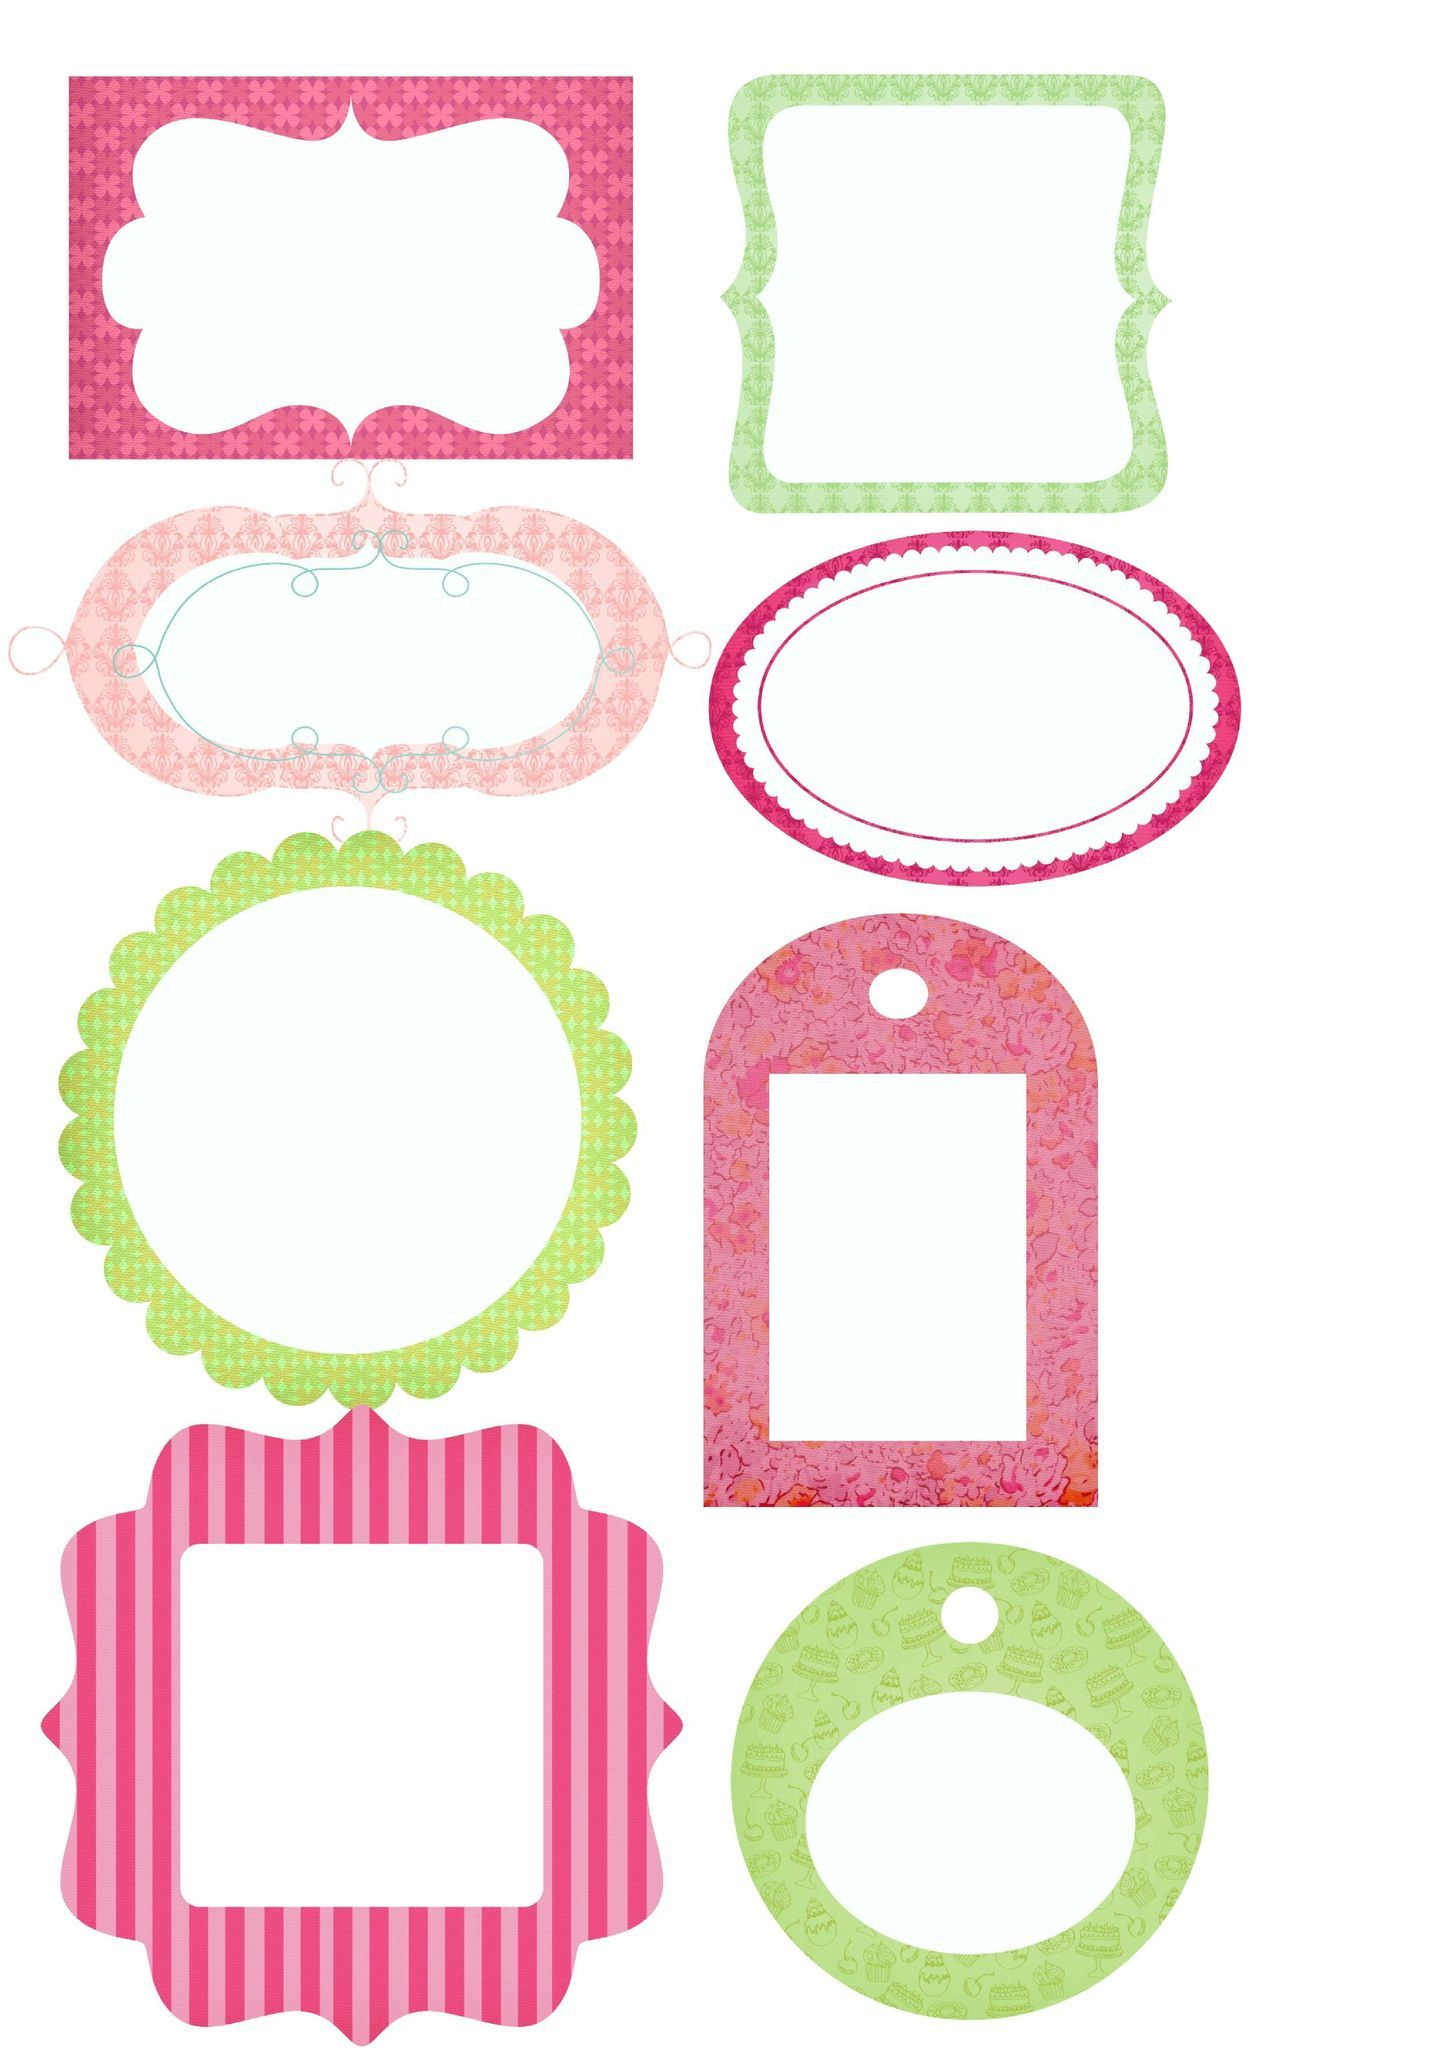 Luxe Image A Imprimer Deco Bebe